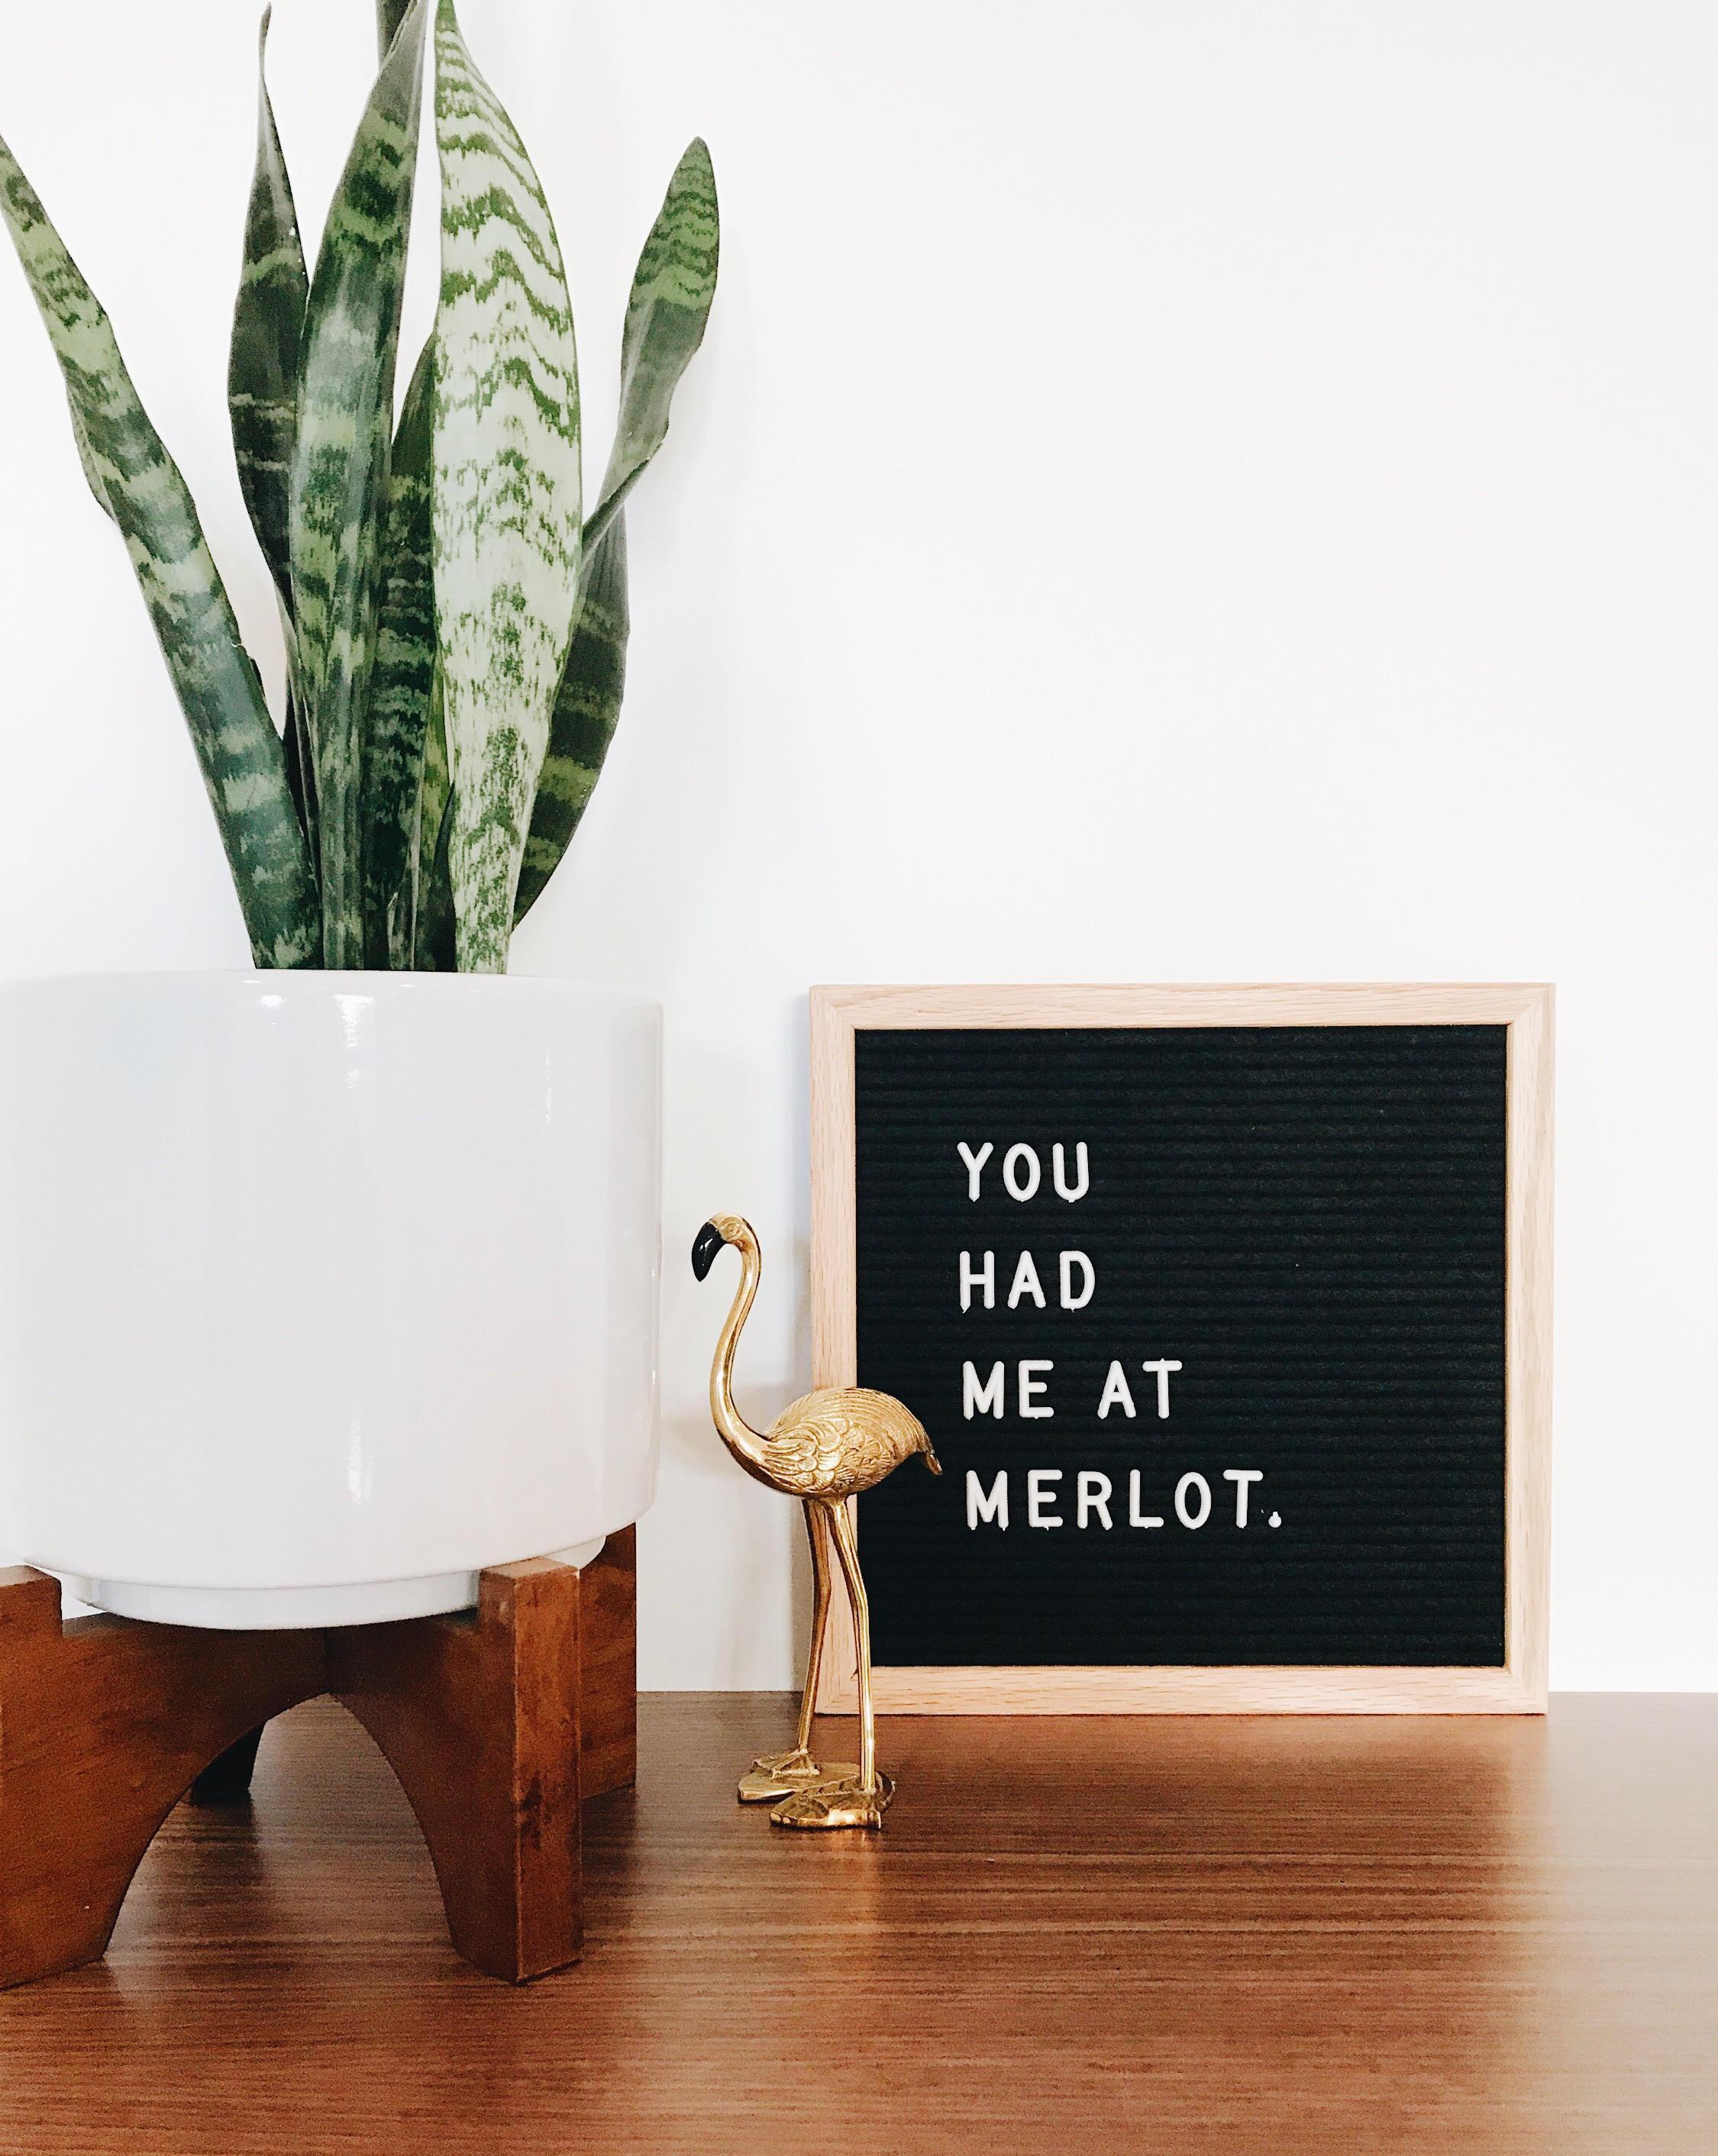 Weekend Link Love, You Had Me At Merlot, Nyla Free Designs Inc., Calgary Interior Designer